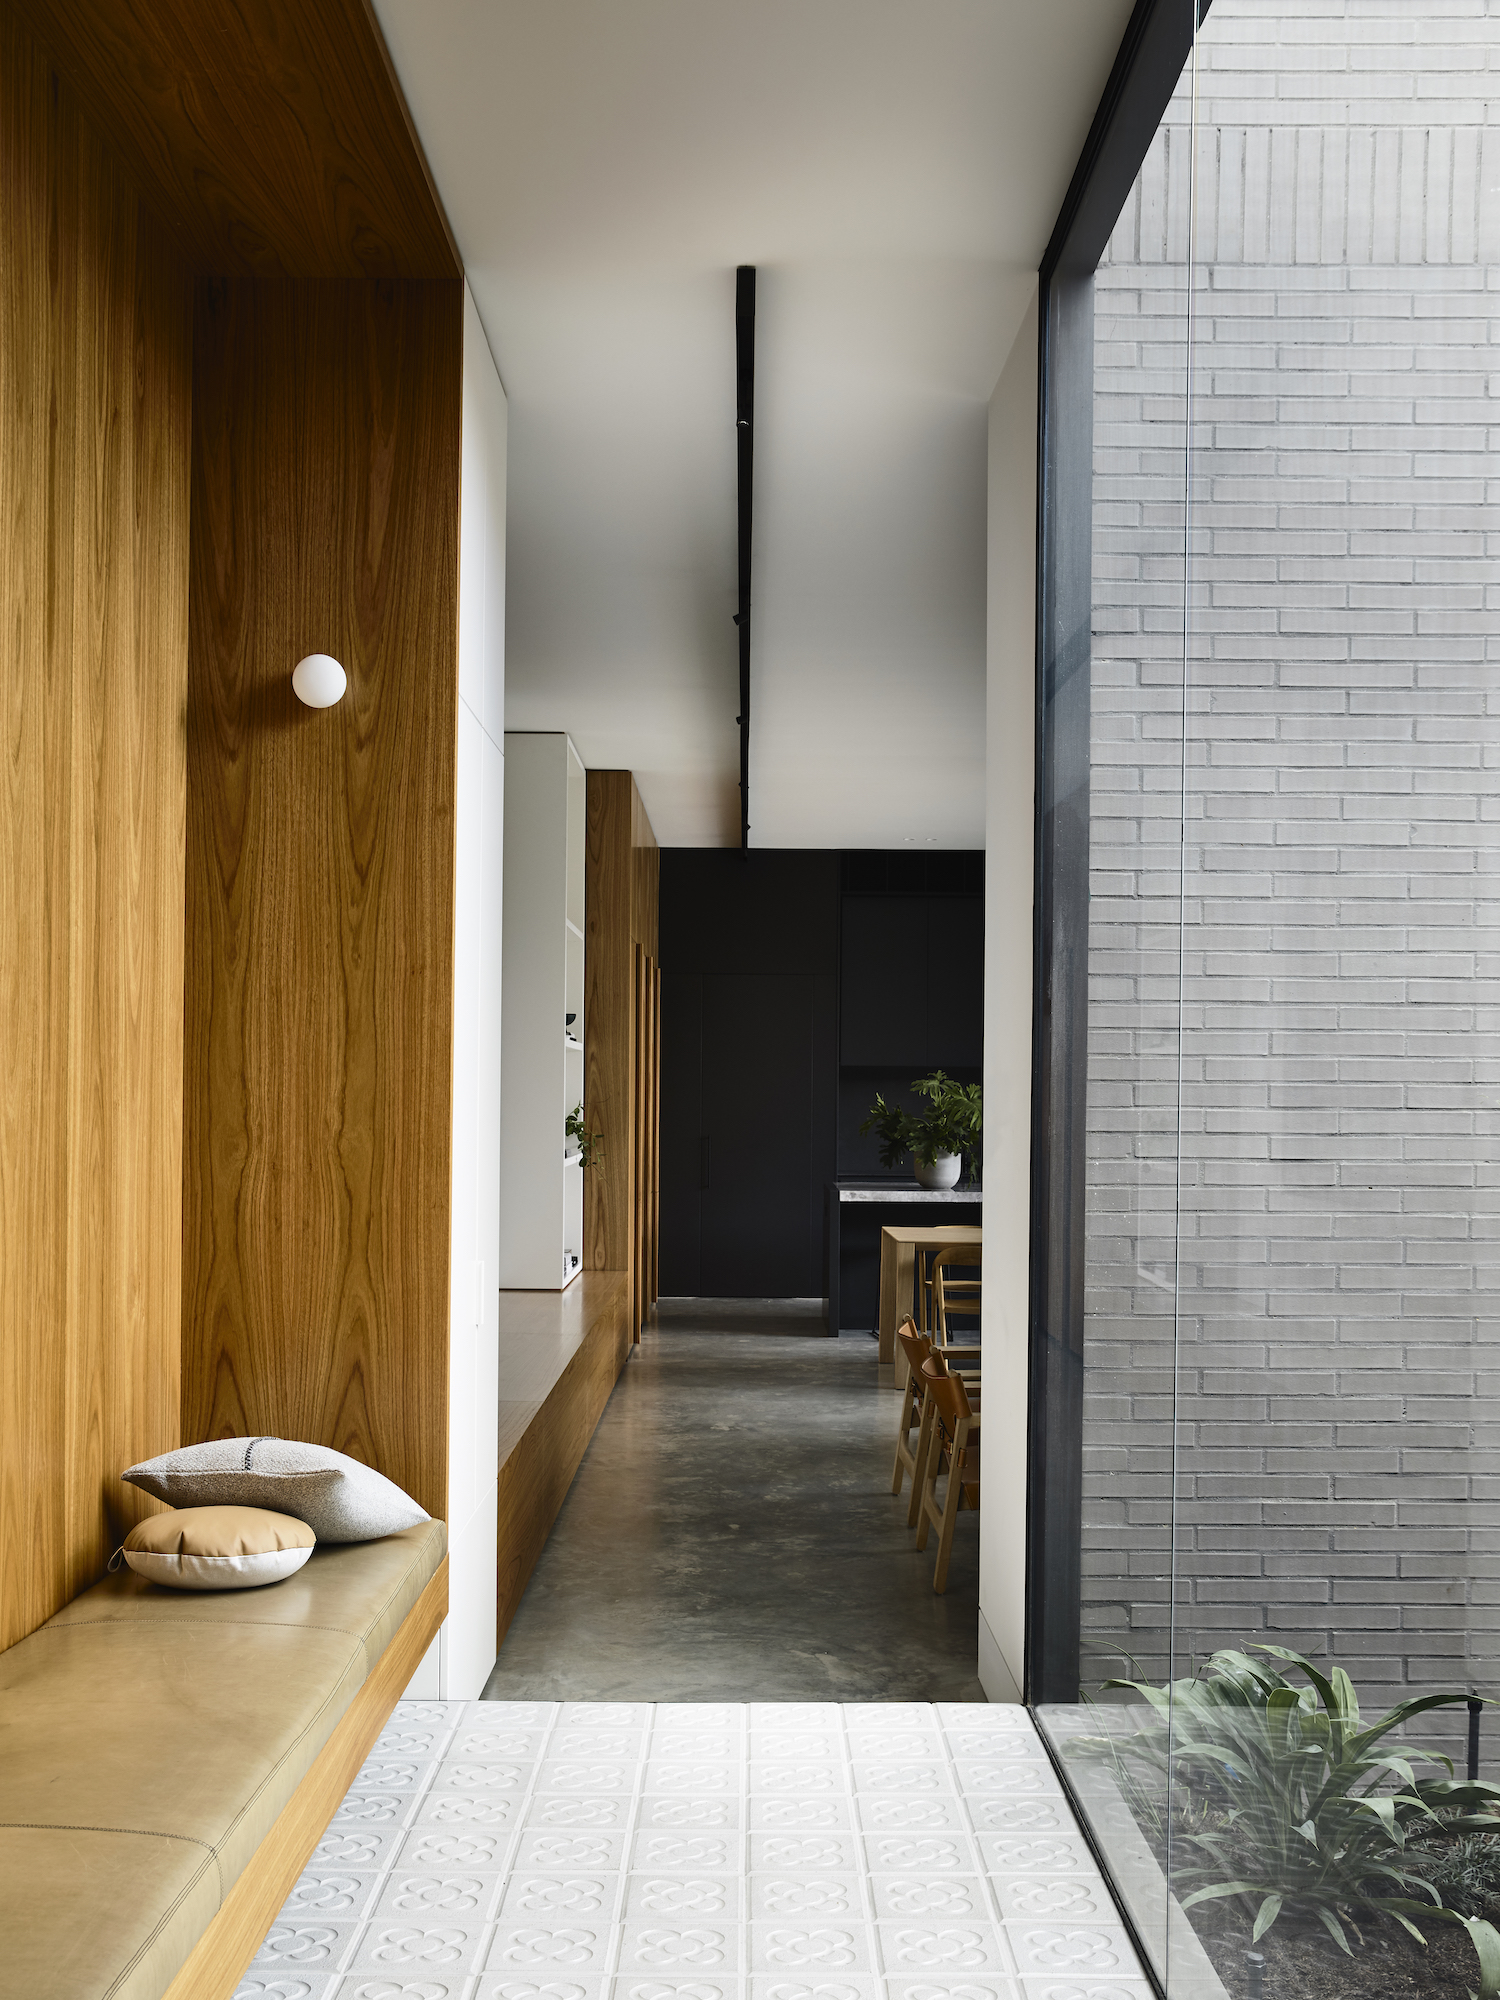 est living wellard architects malvern east 5